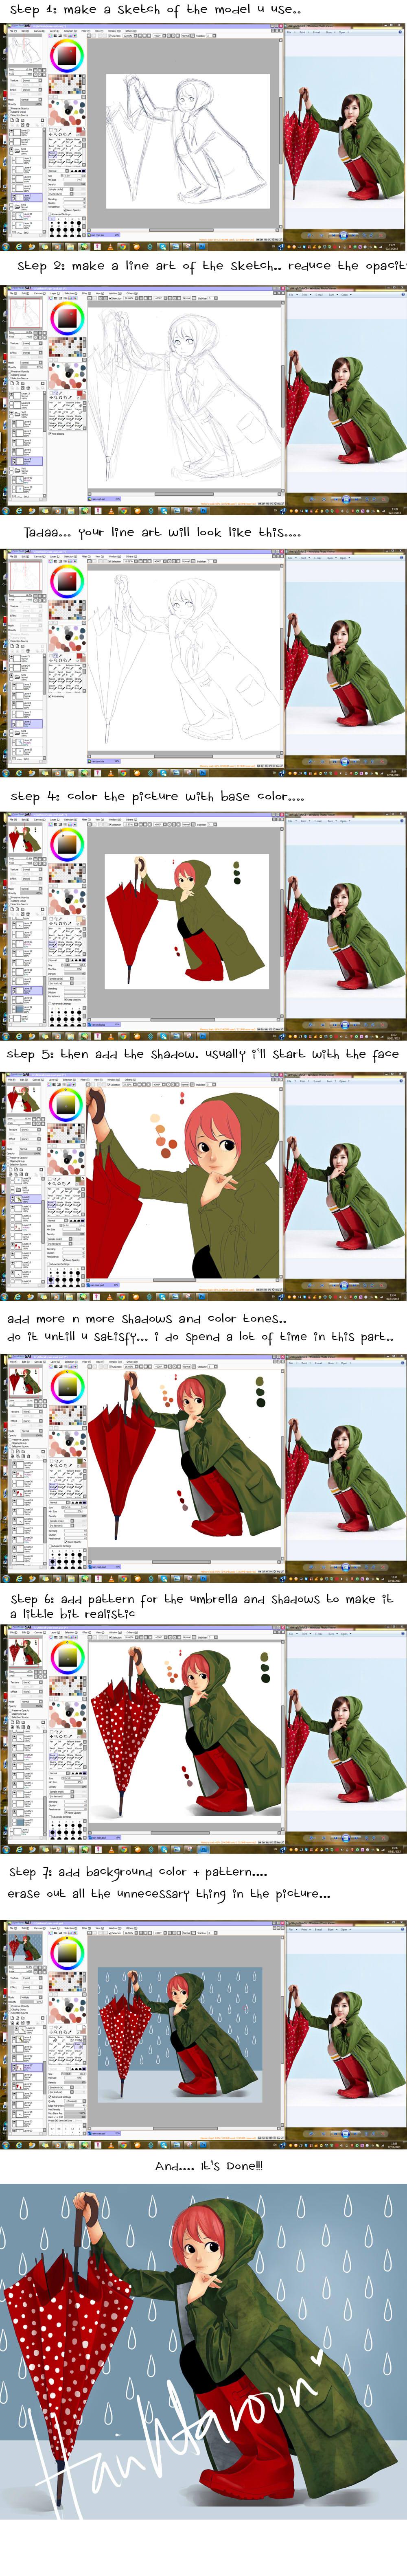 wip__rain_coat_by_harihtaroon-d6sp7sp.jpg